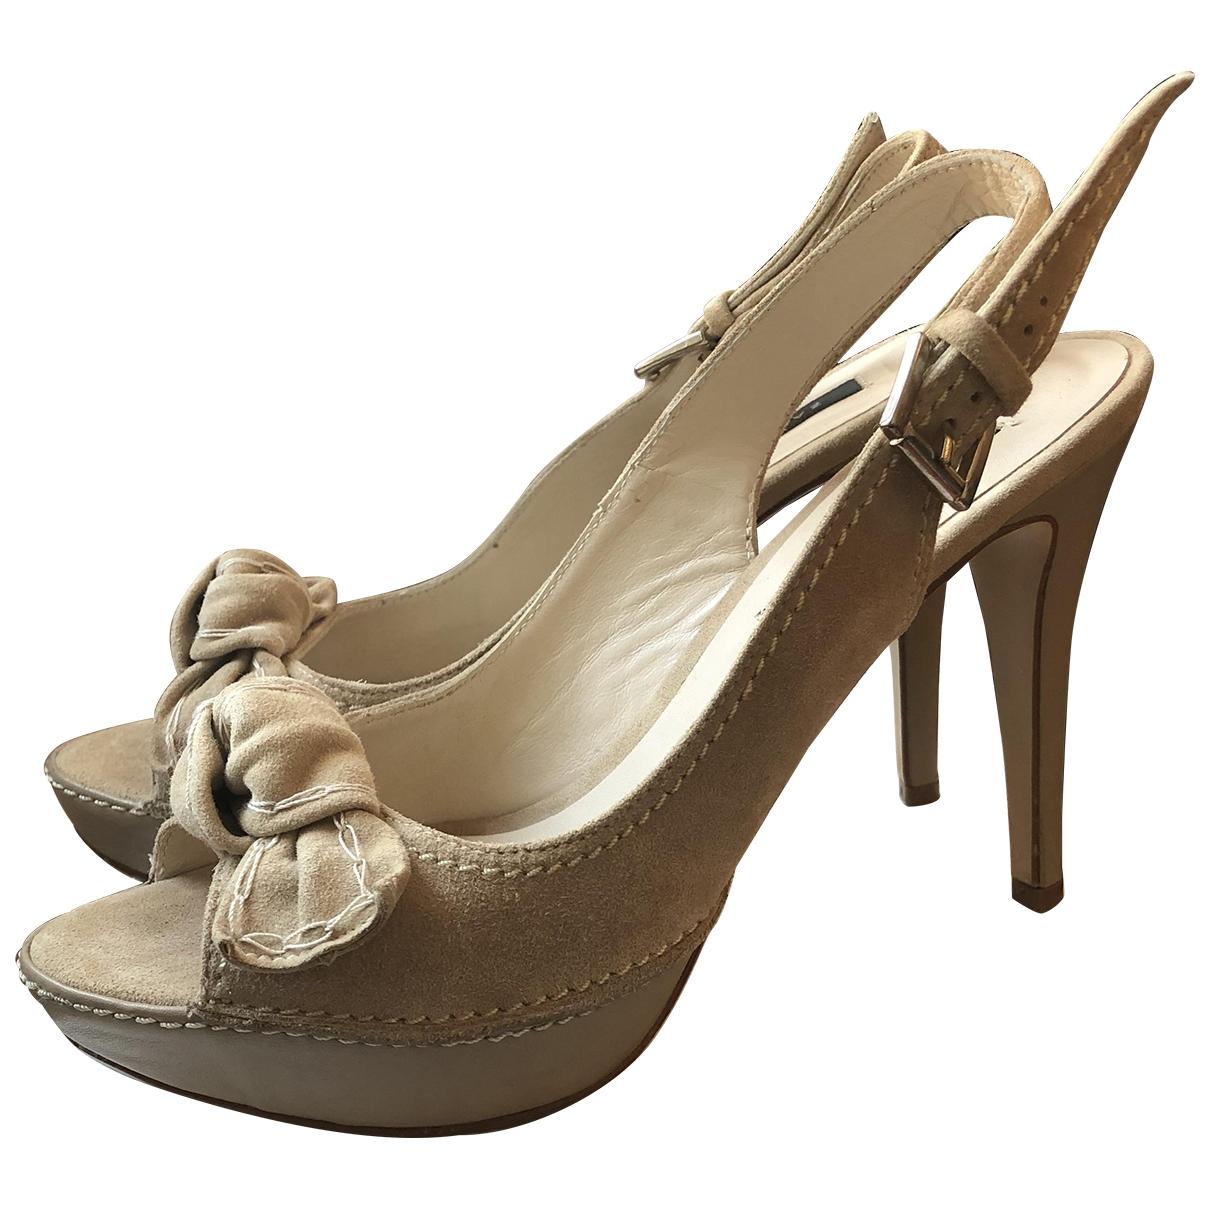 Zara - Escarpins   pour femme en suede - beige